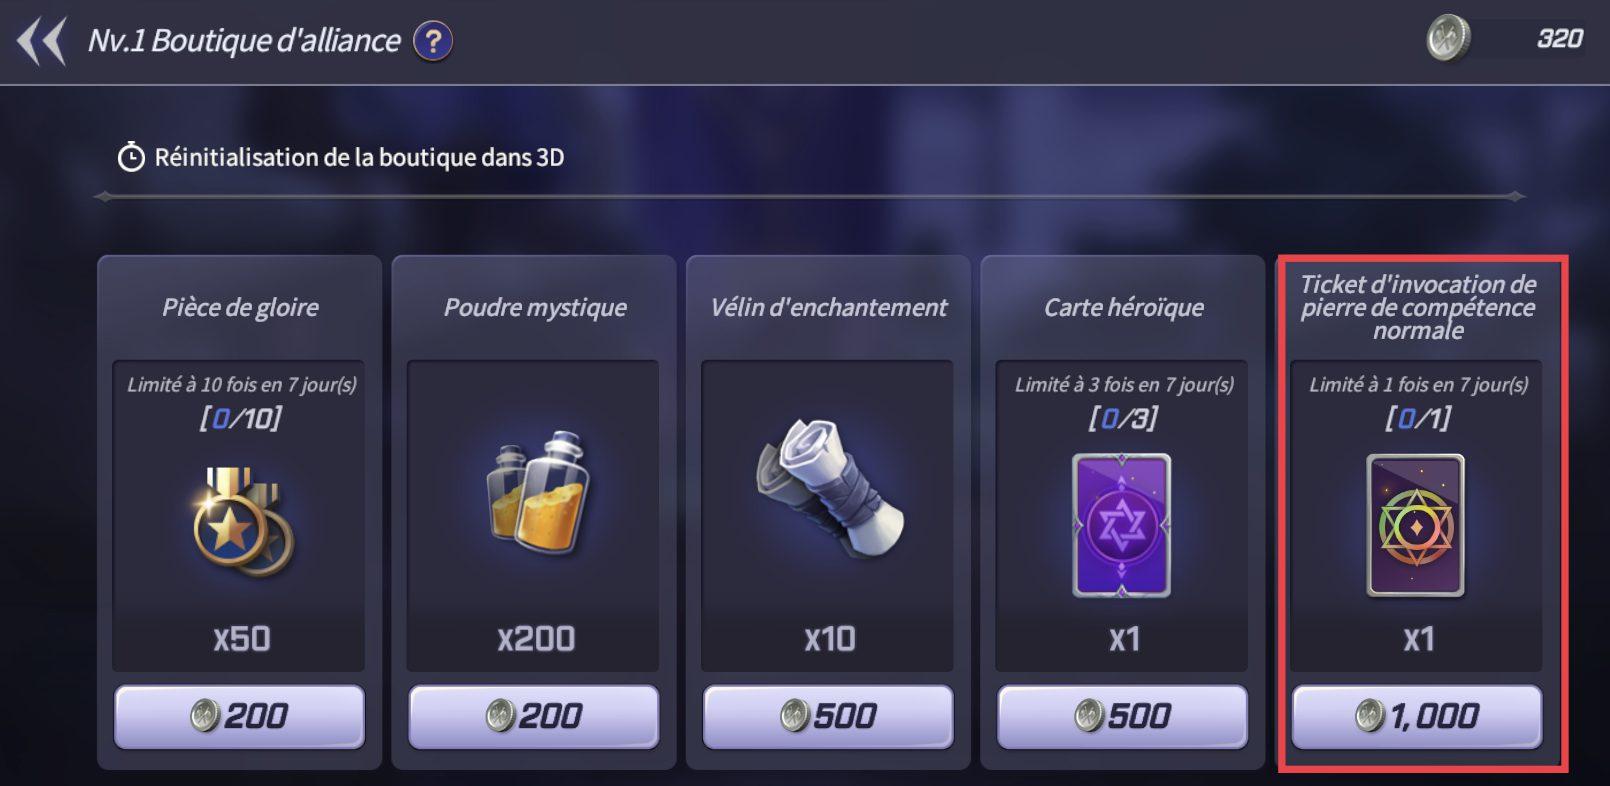 Boutique d'alliance Lost Centuria